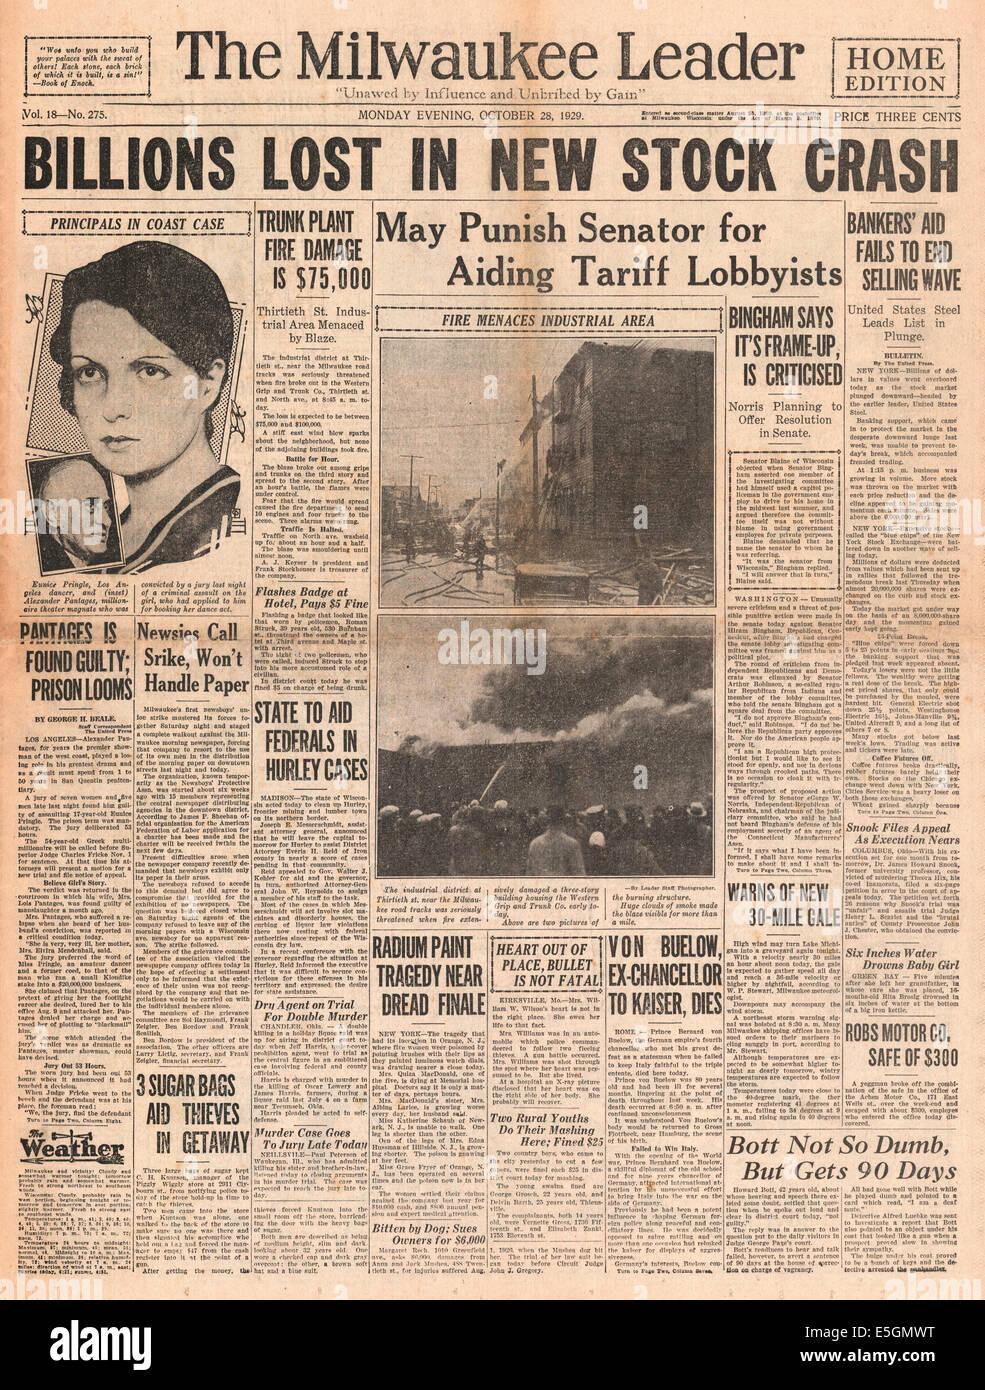 1929 Milwaukee Journal (USA) pagina anteriore reporting crollo di Wall Street Immagini Stock